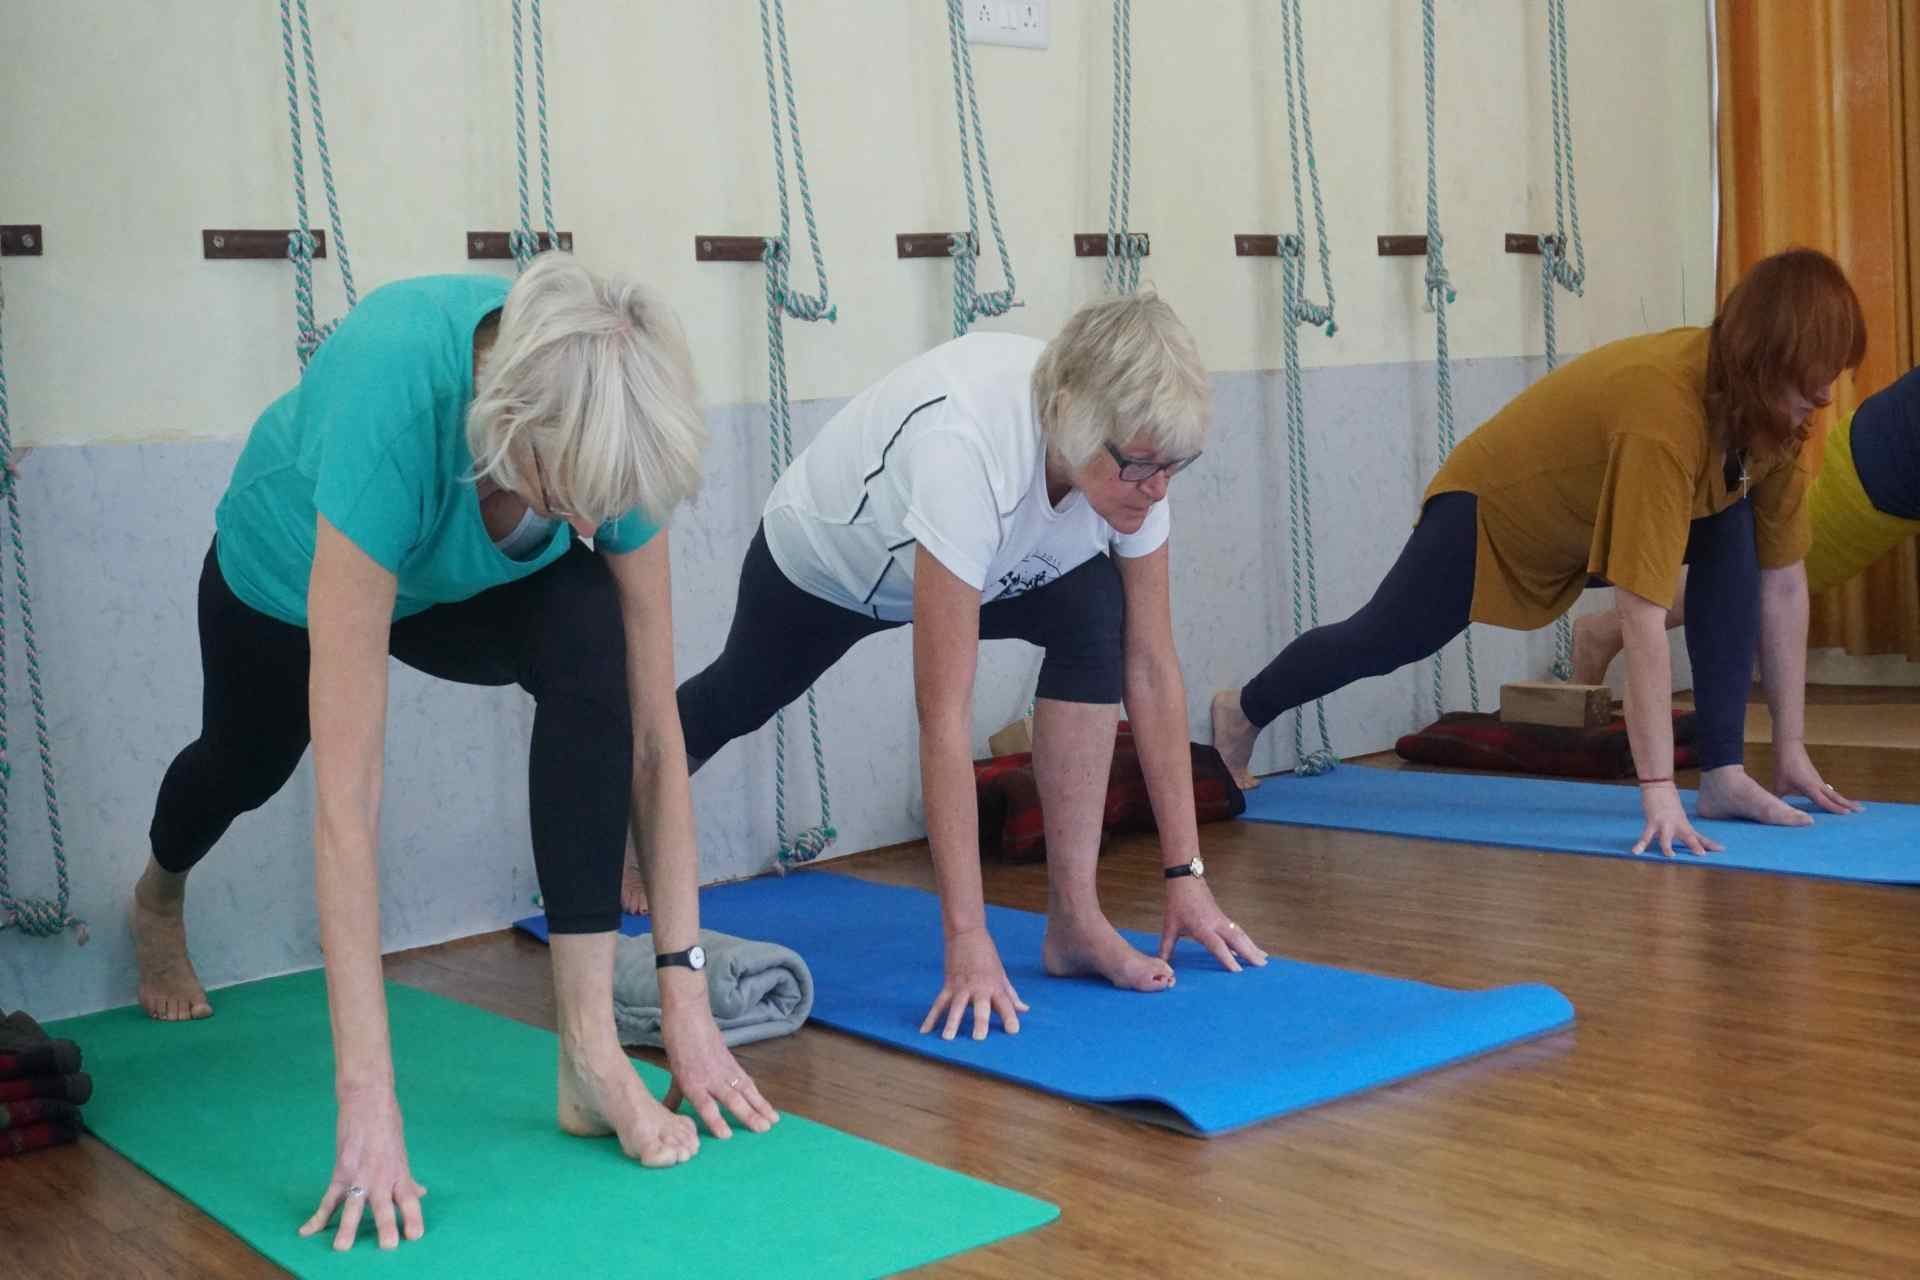 benefits of regular exercise, walking, swimming, daily workout